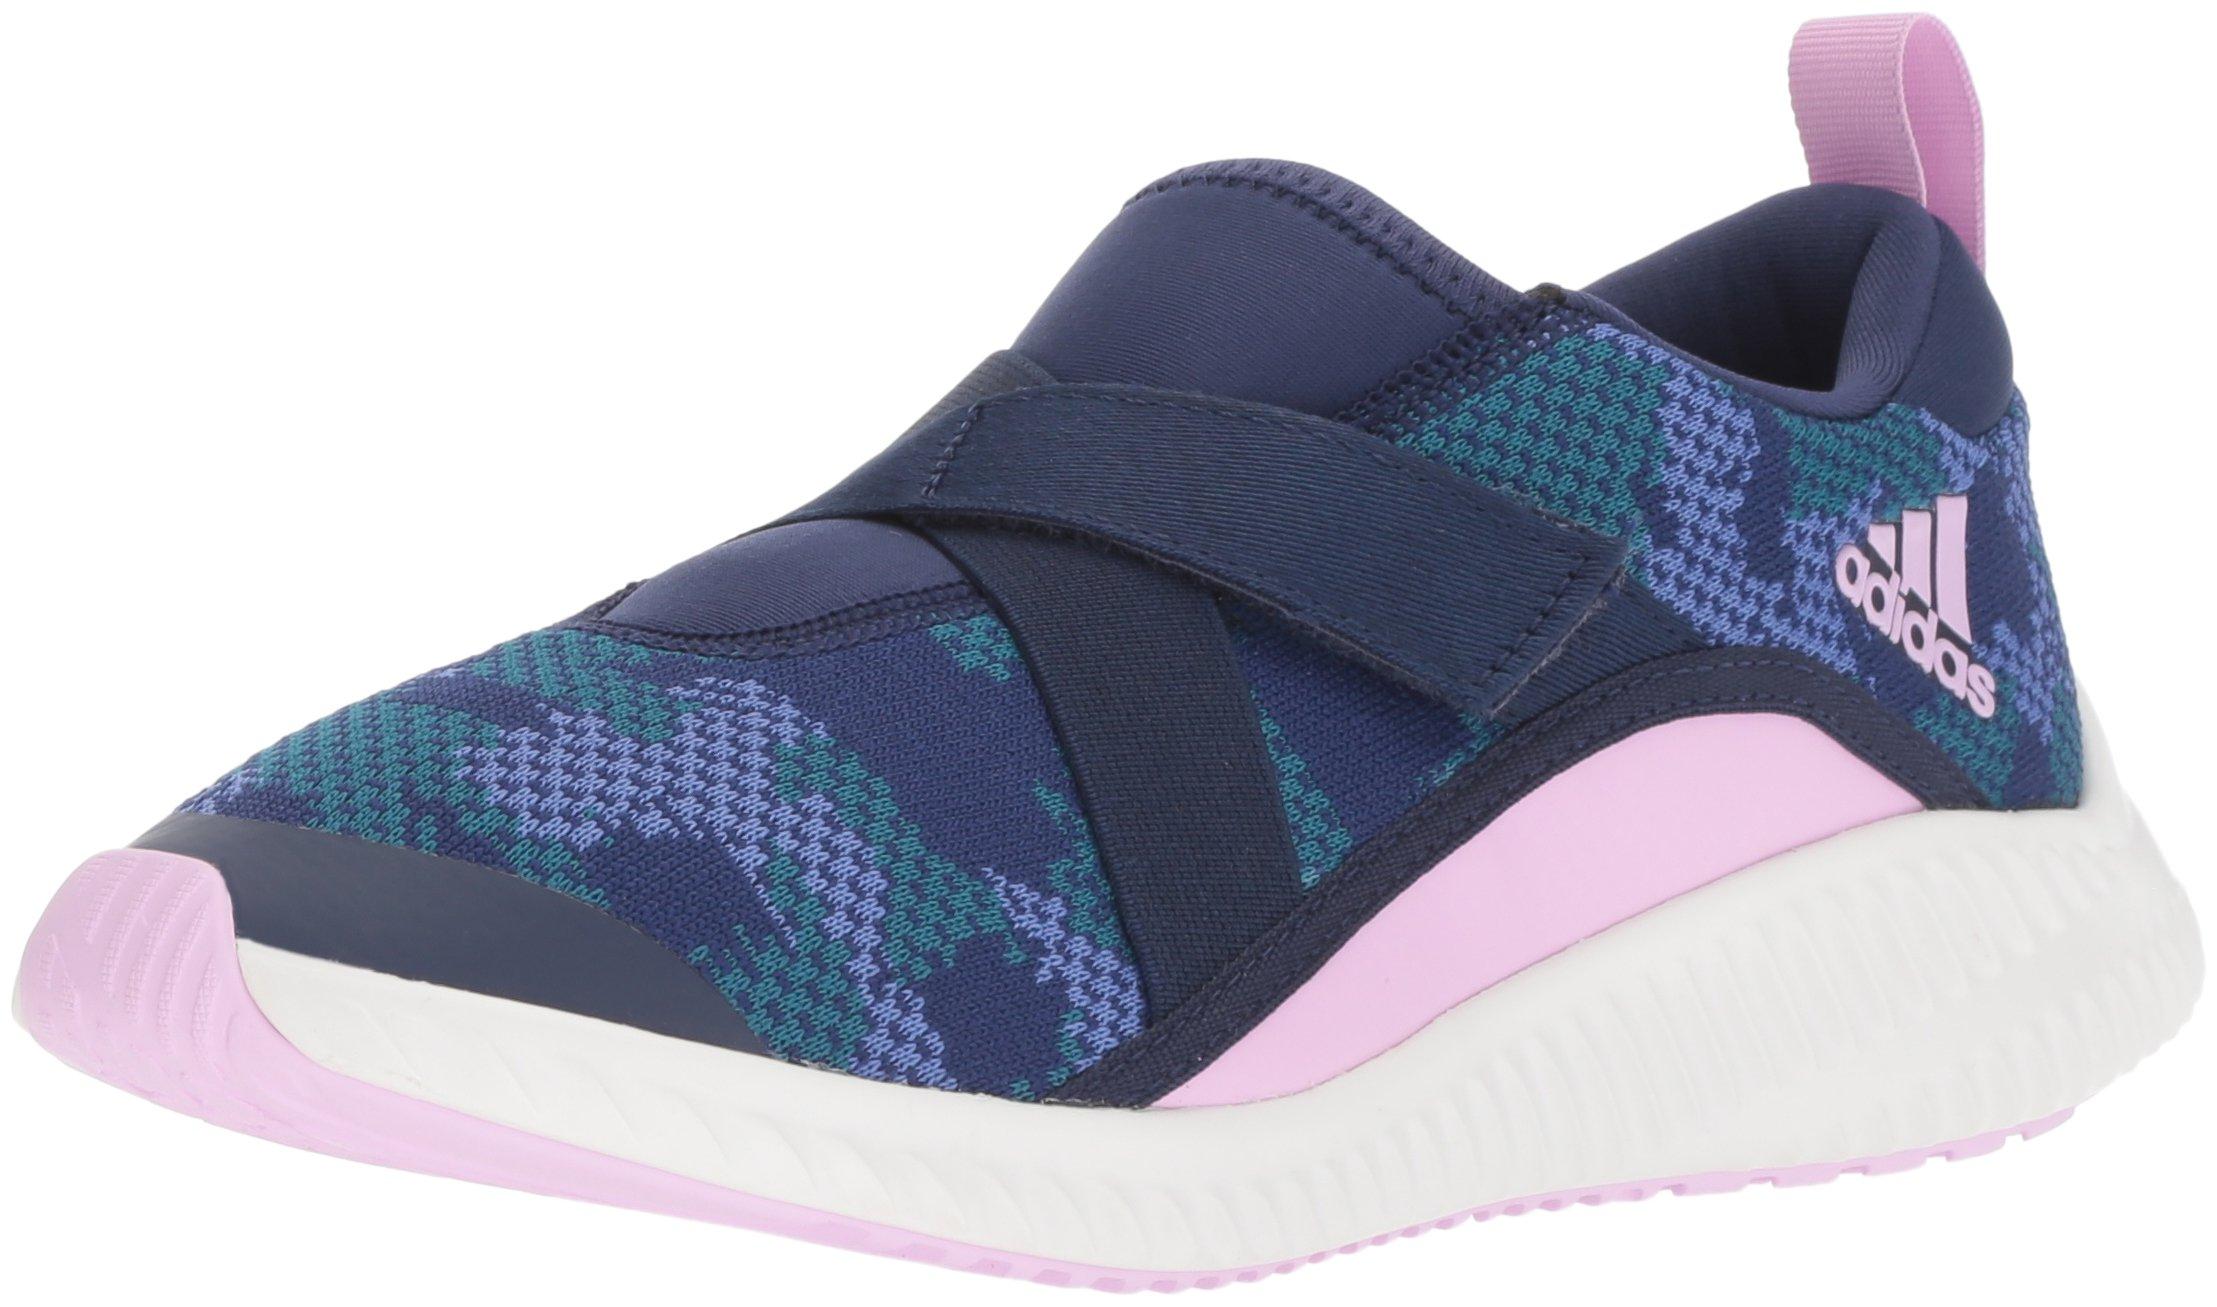 adidas Originals Unisex-Kids Fortarun Running Shoe, Dark Blue/Clear Lilac/Real Lilac, 1 M US Little Kid